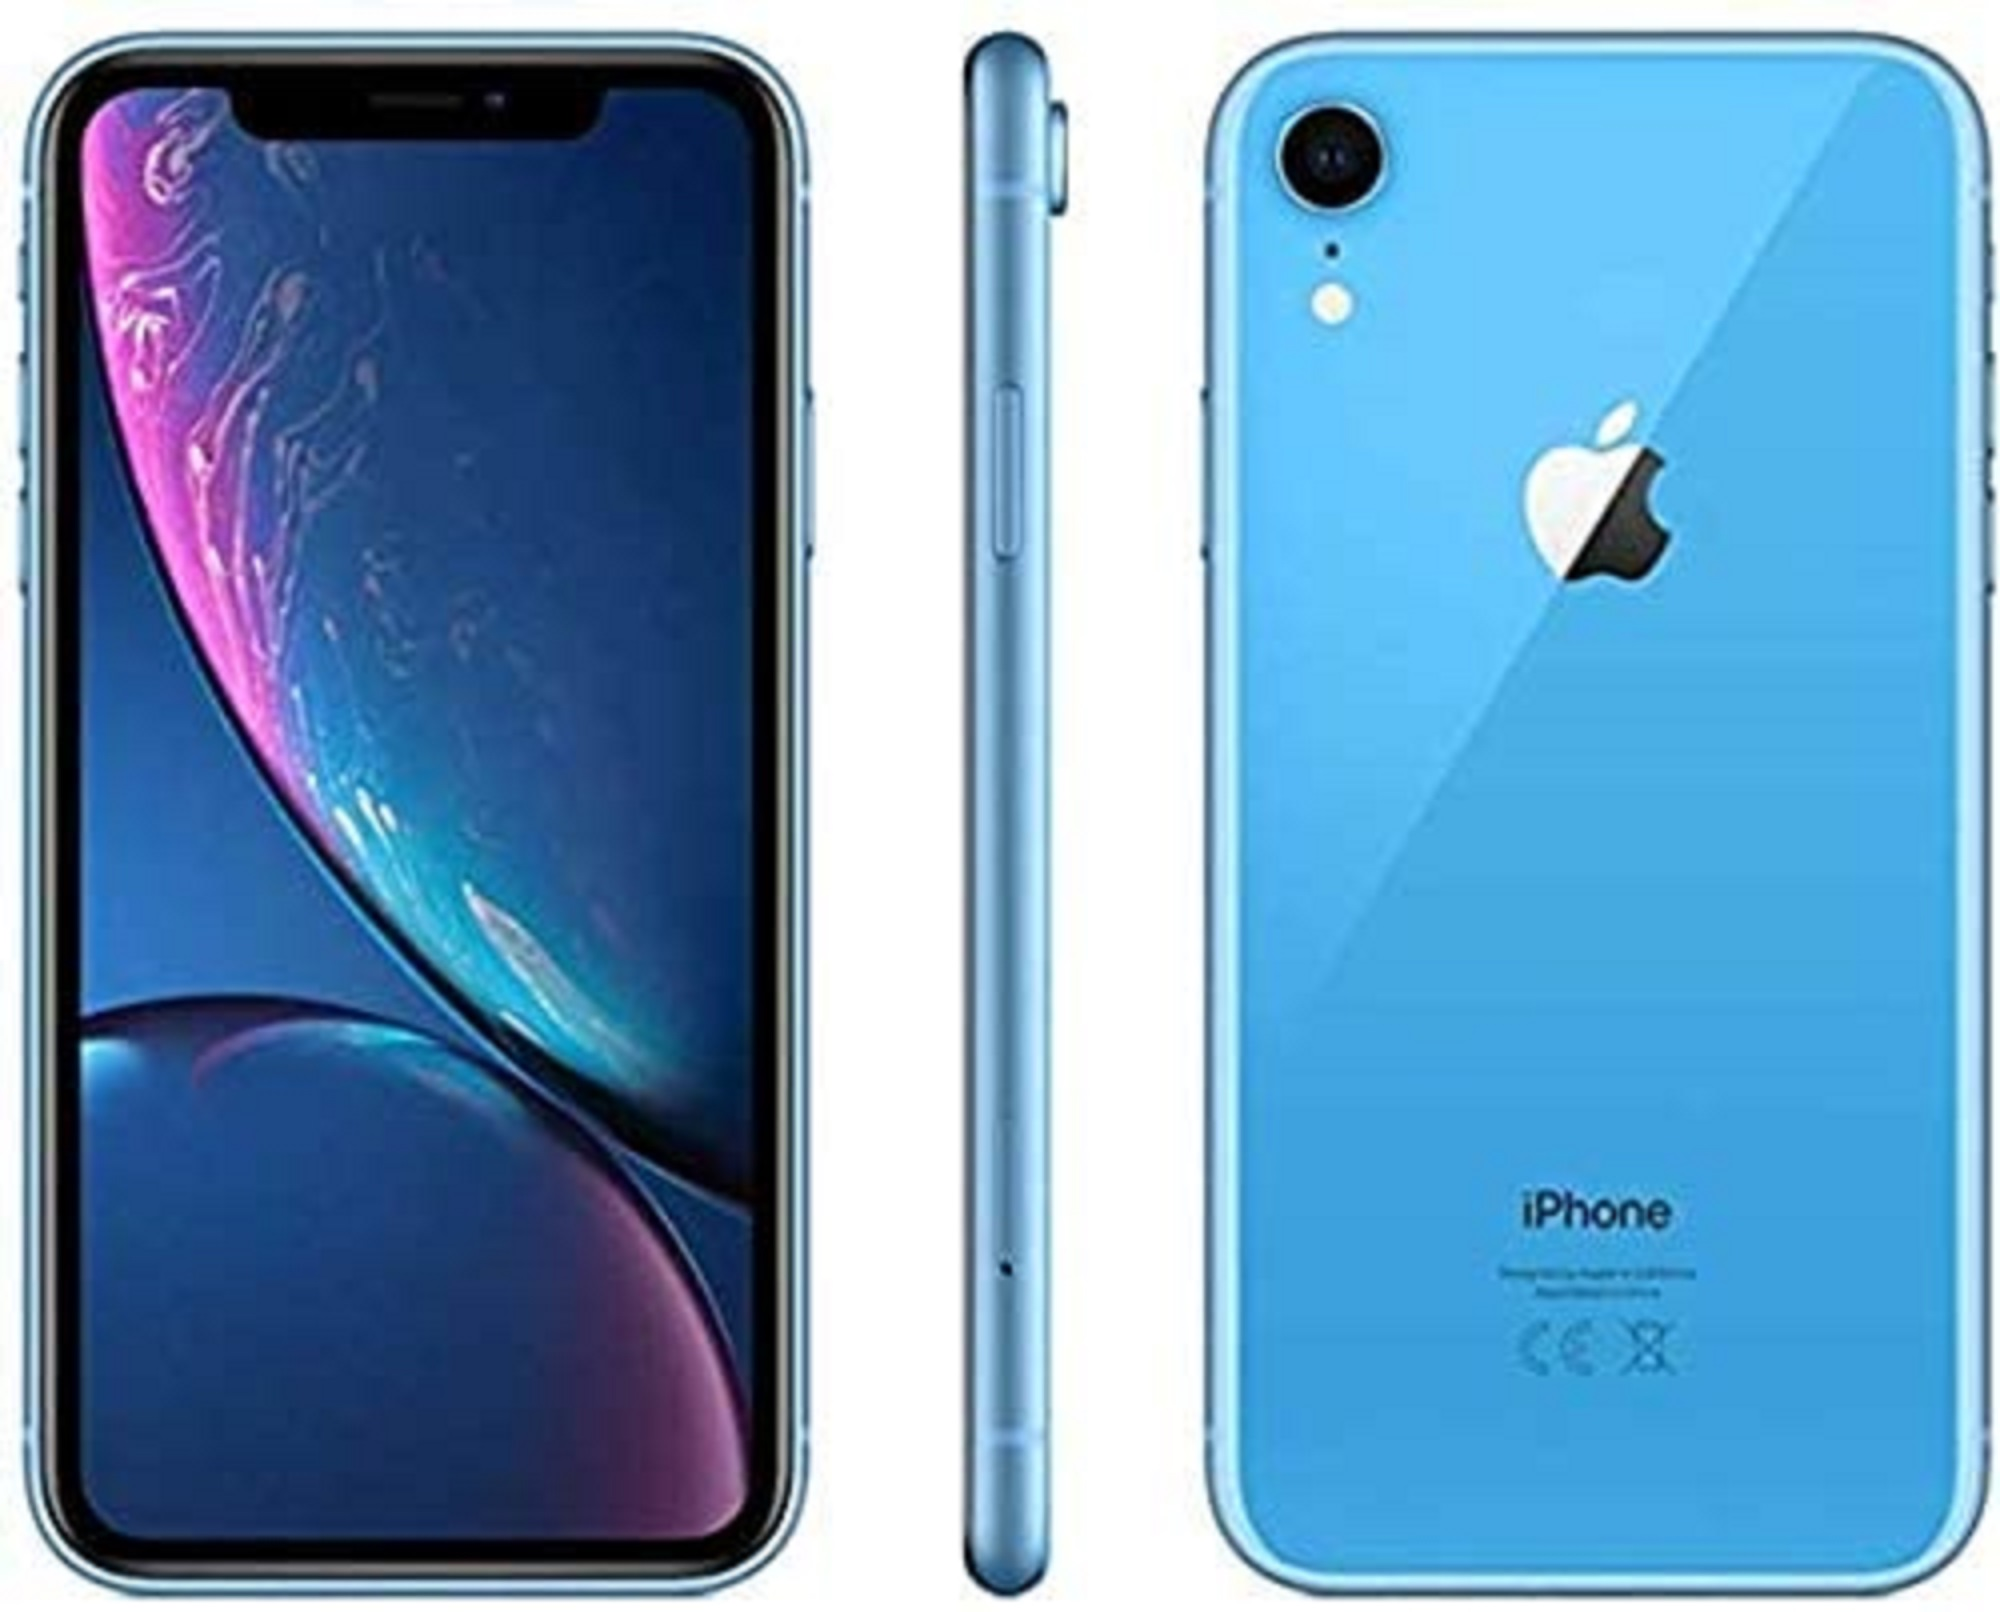 thumbnail 9 - Apple iPhone XR 64GB Factory Unlocked Smartphone 4G LTE iOS Smartphone - Very